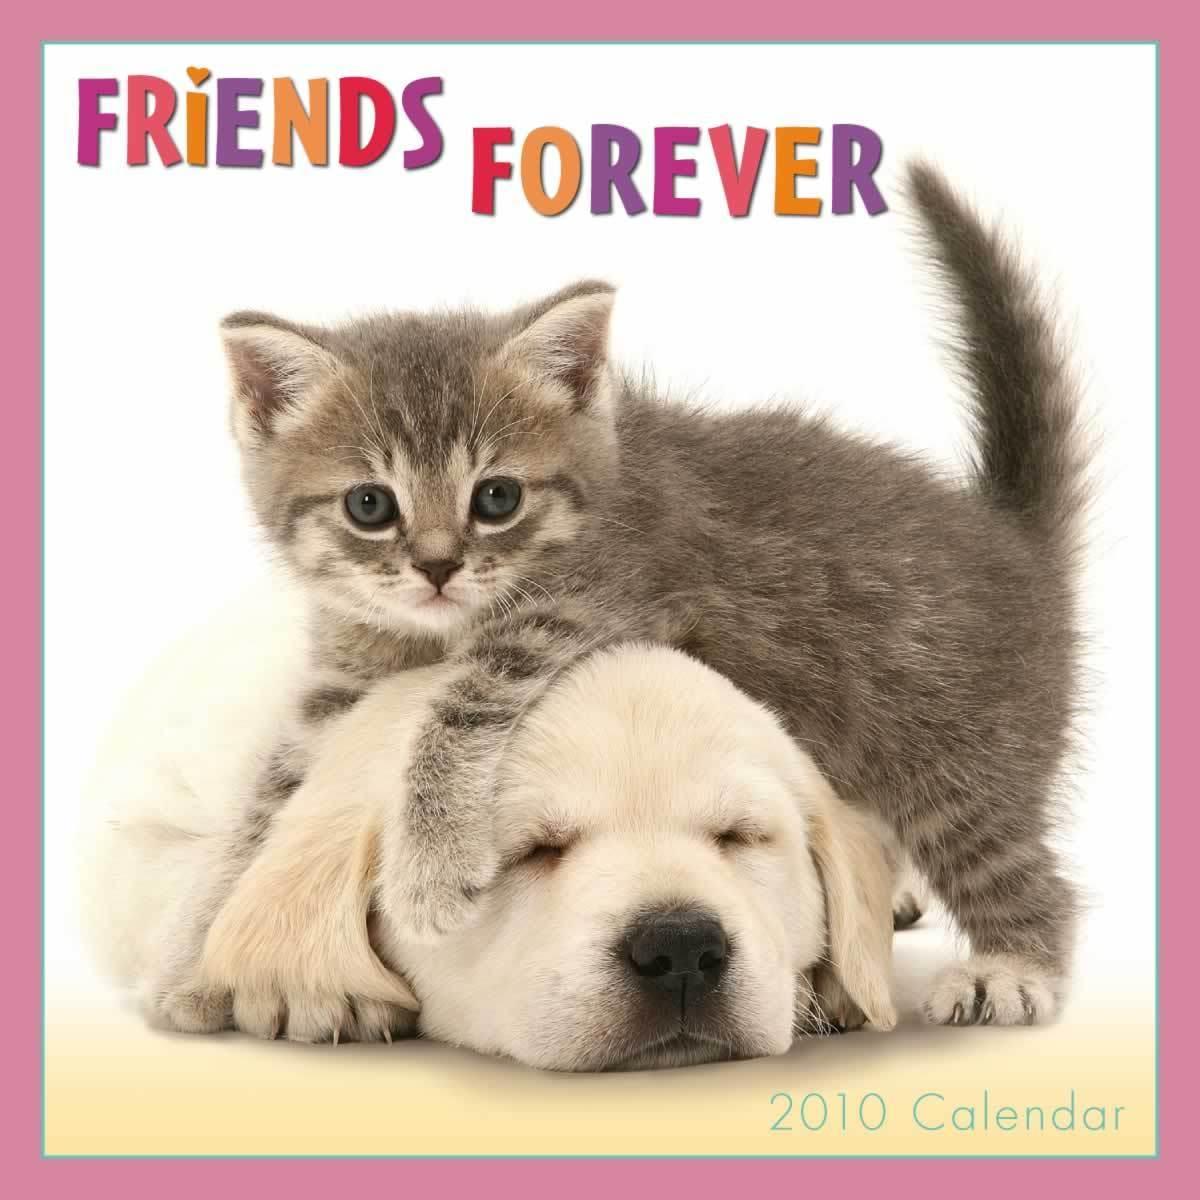 I Heart Dogs Furever Friends